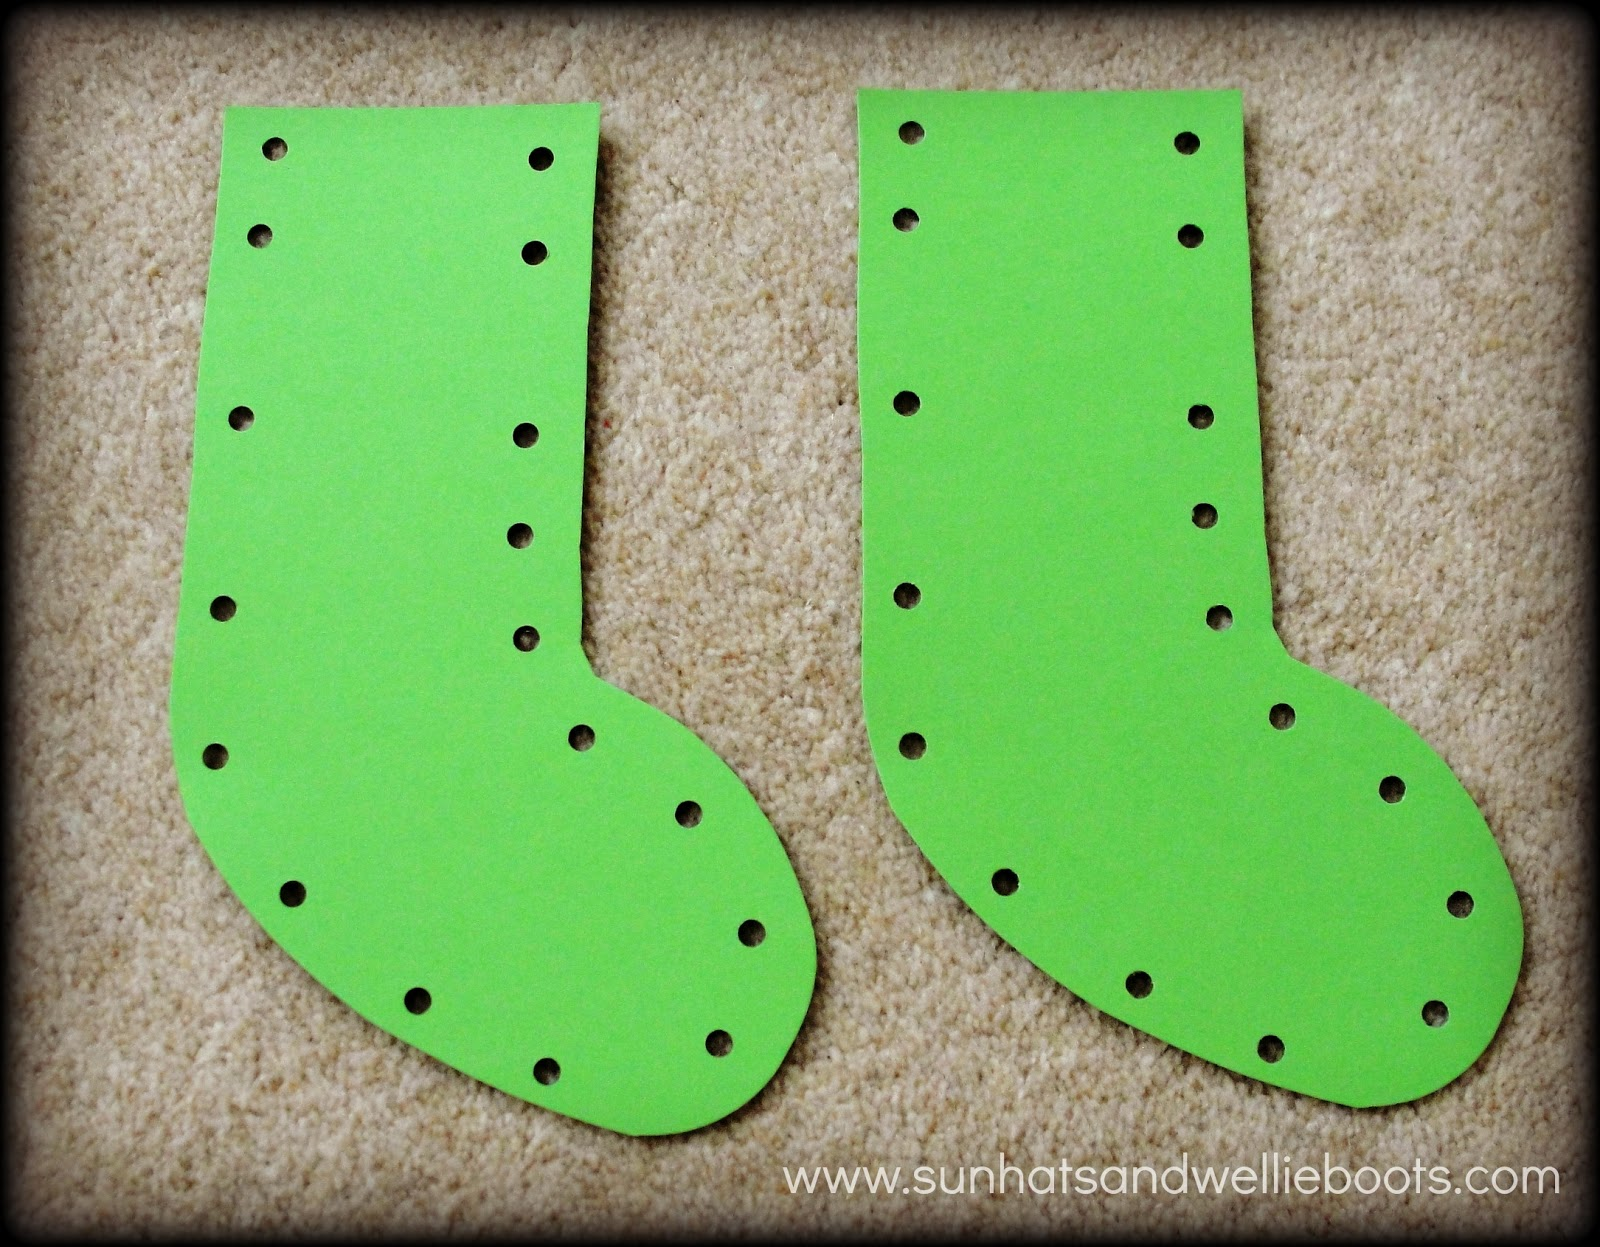 sun hats u0026 wellie boots christmas stockings threading decorations